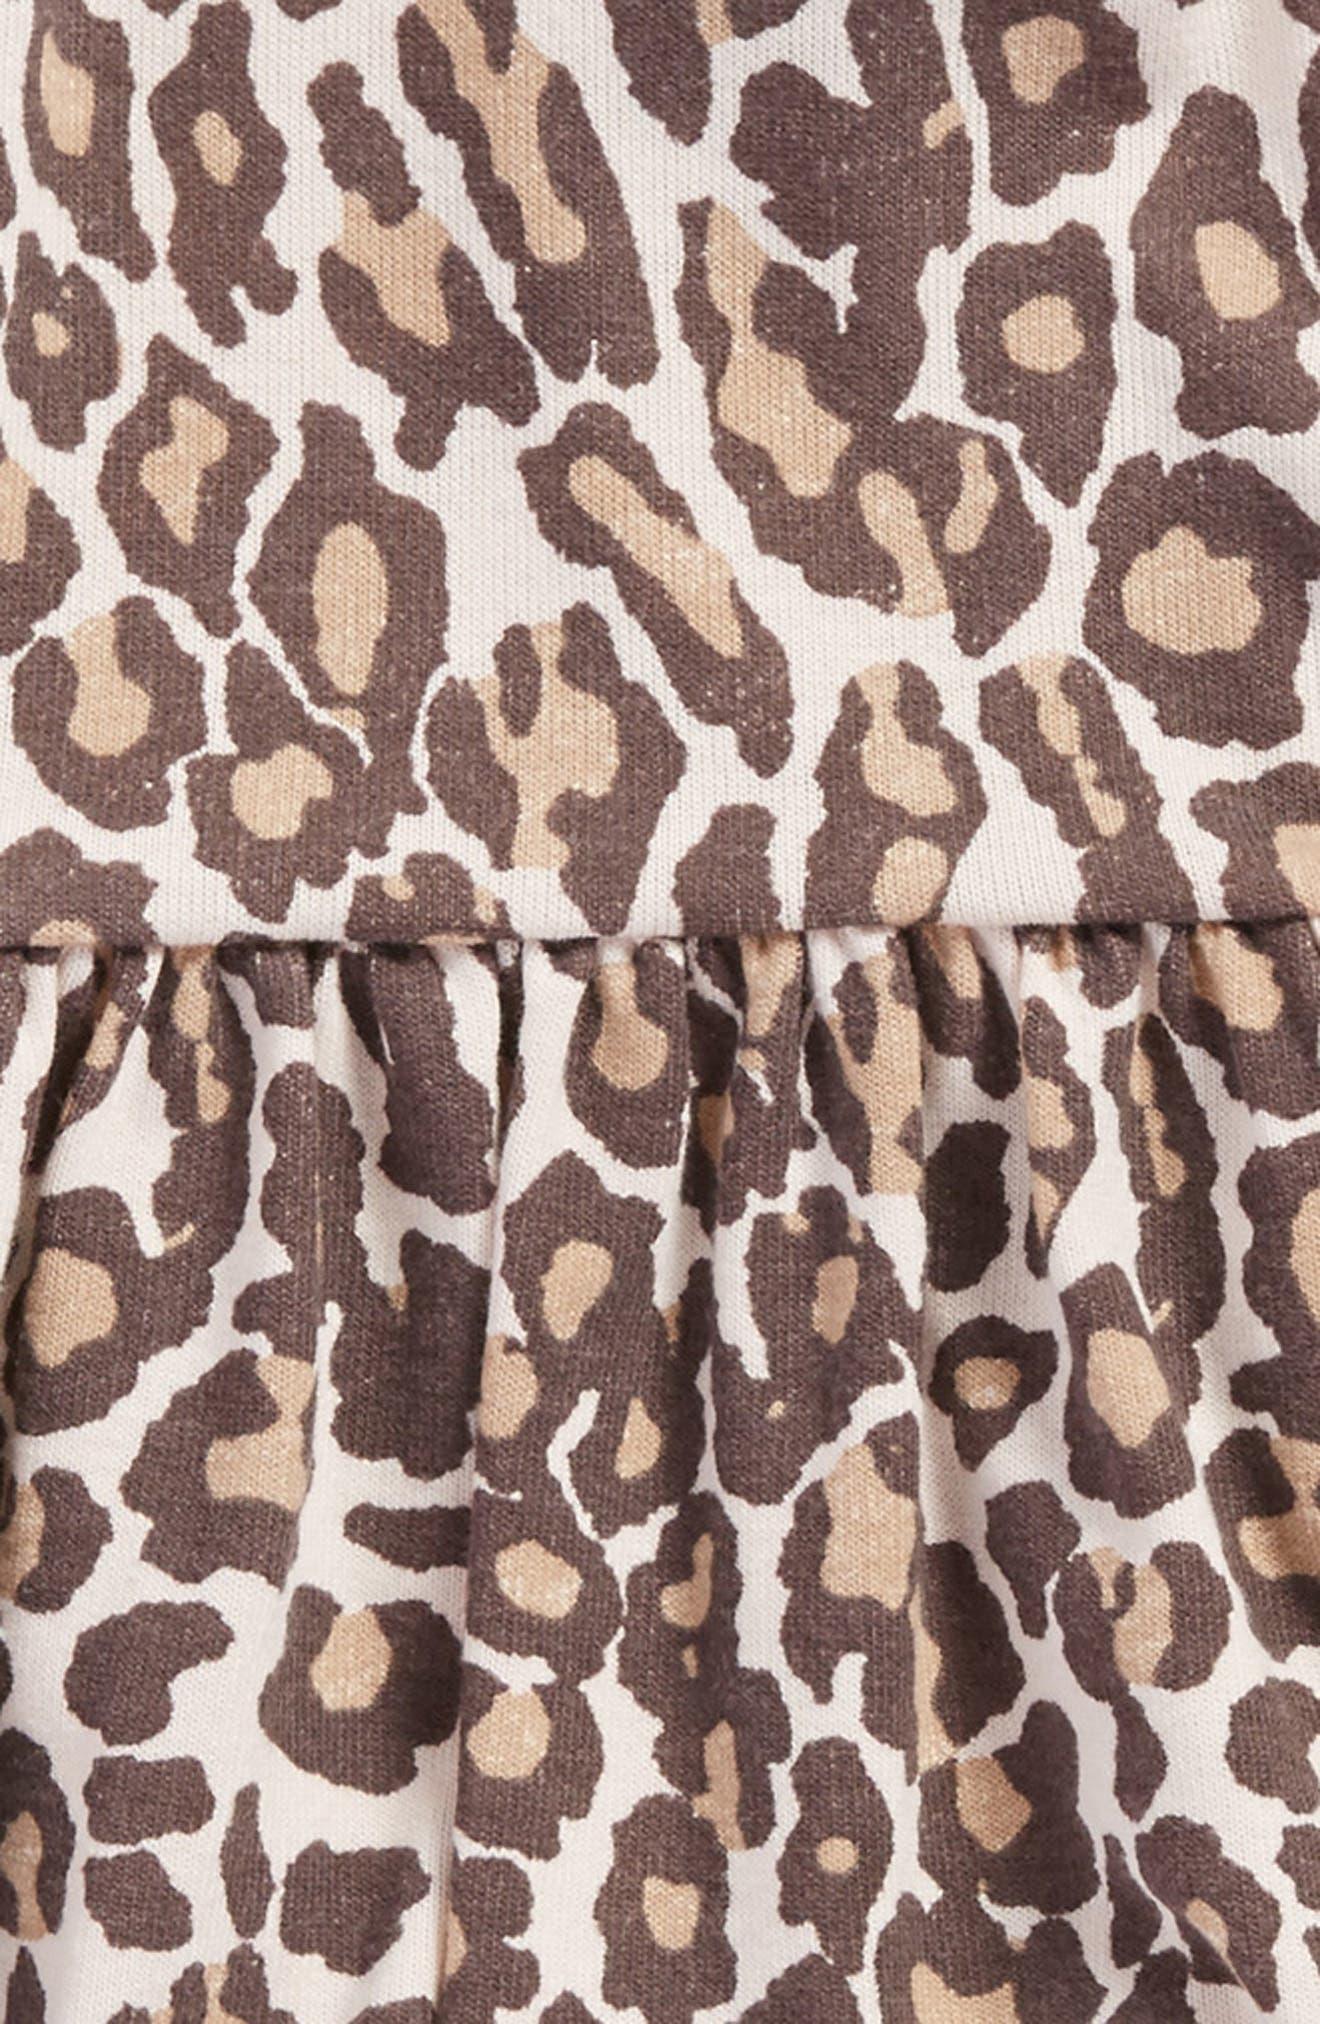 Animal Print Knit Dress,                             Alternate thumbnail 3, color,                             255